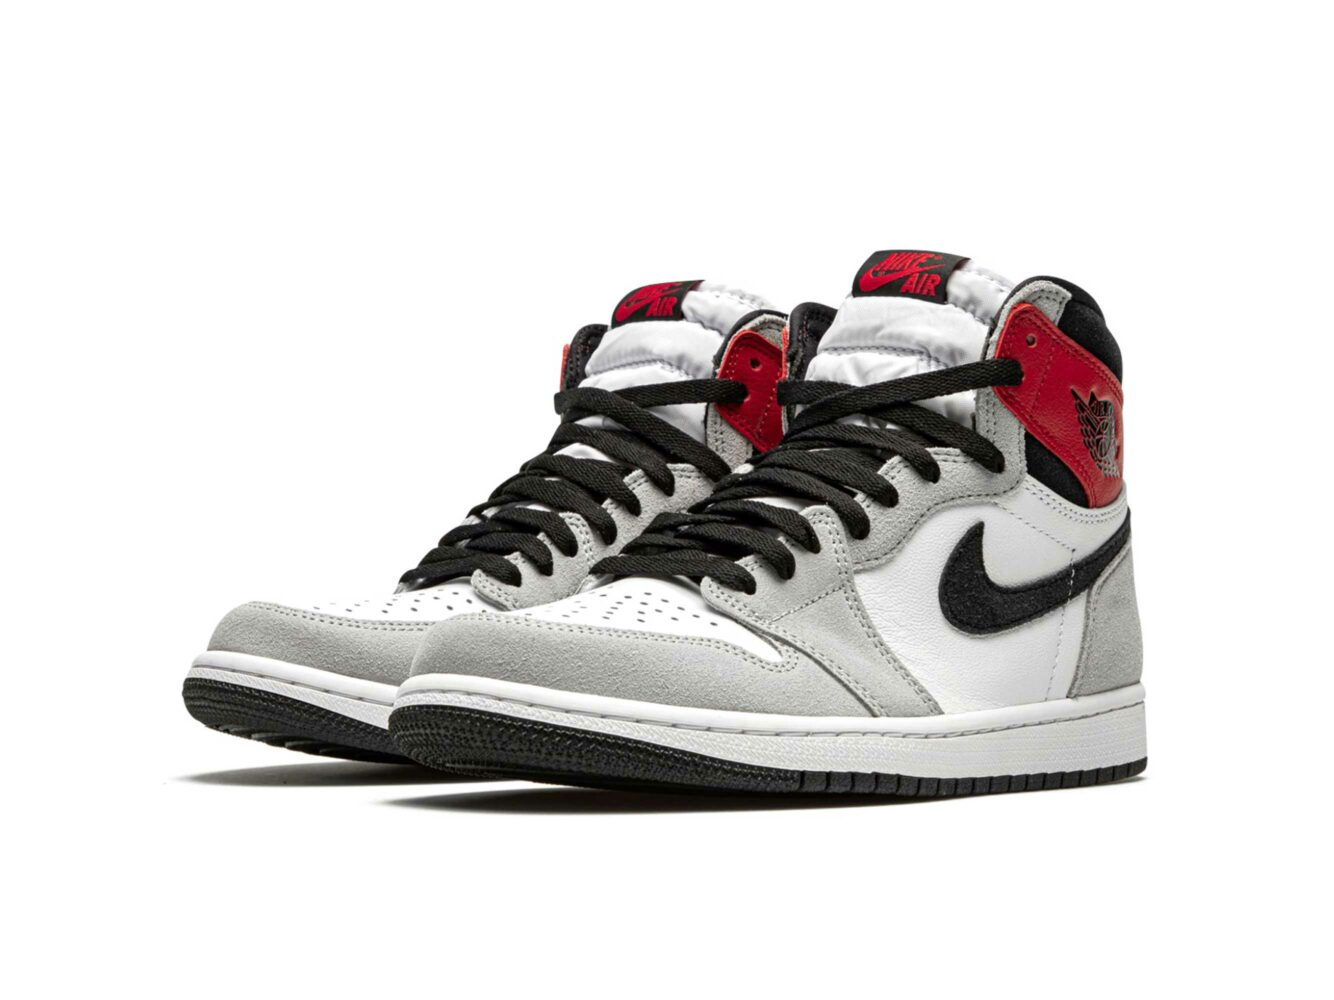 nike air Jordan 1 retro high og light smoke grey 555088_126 купить